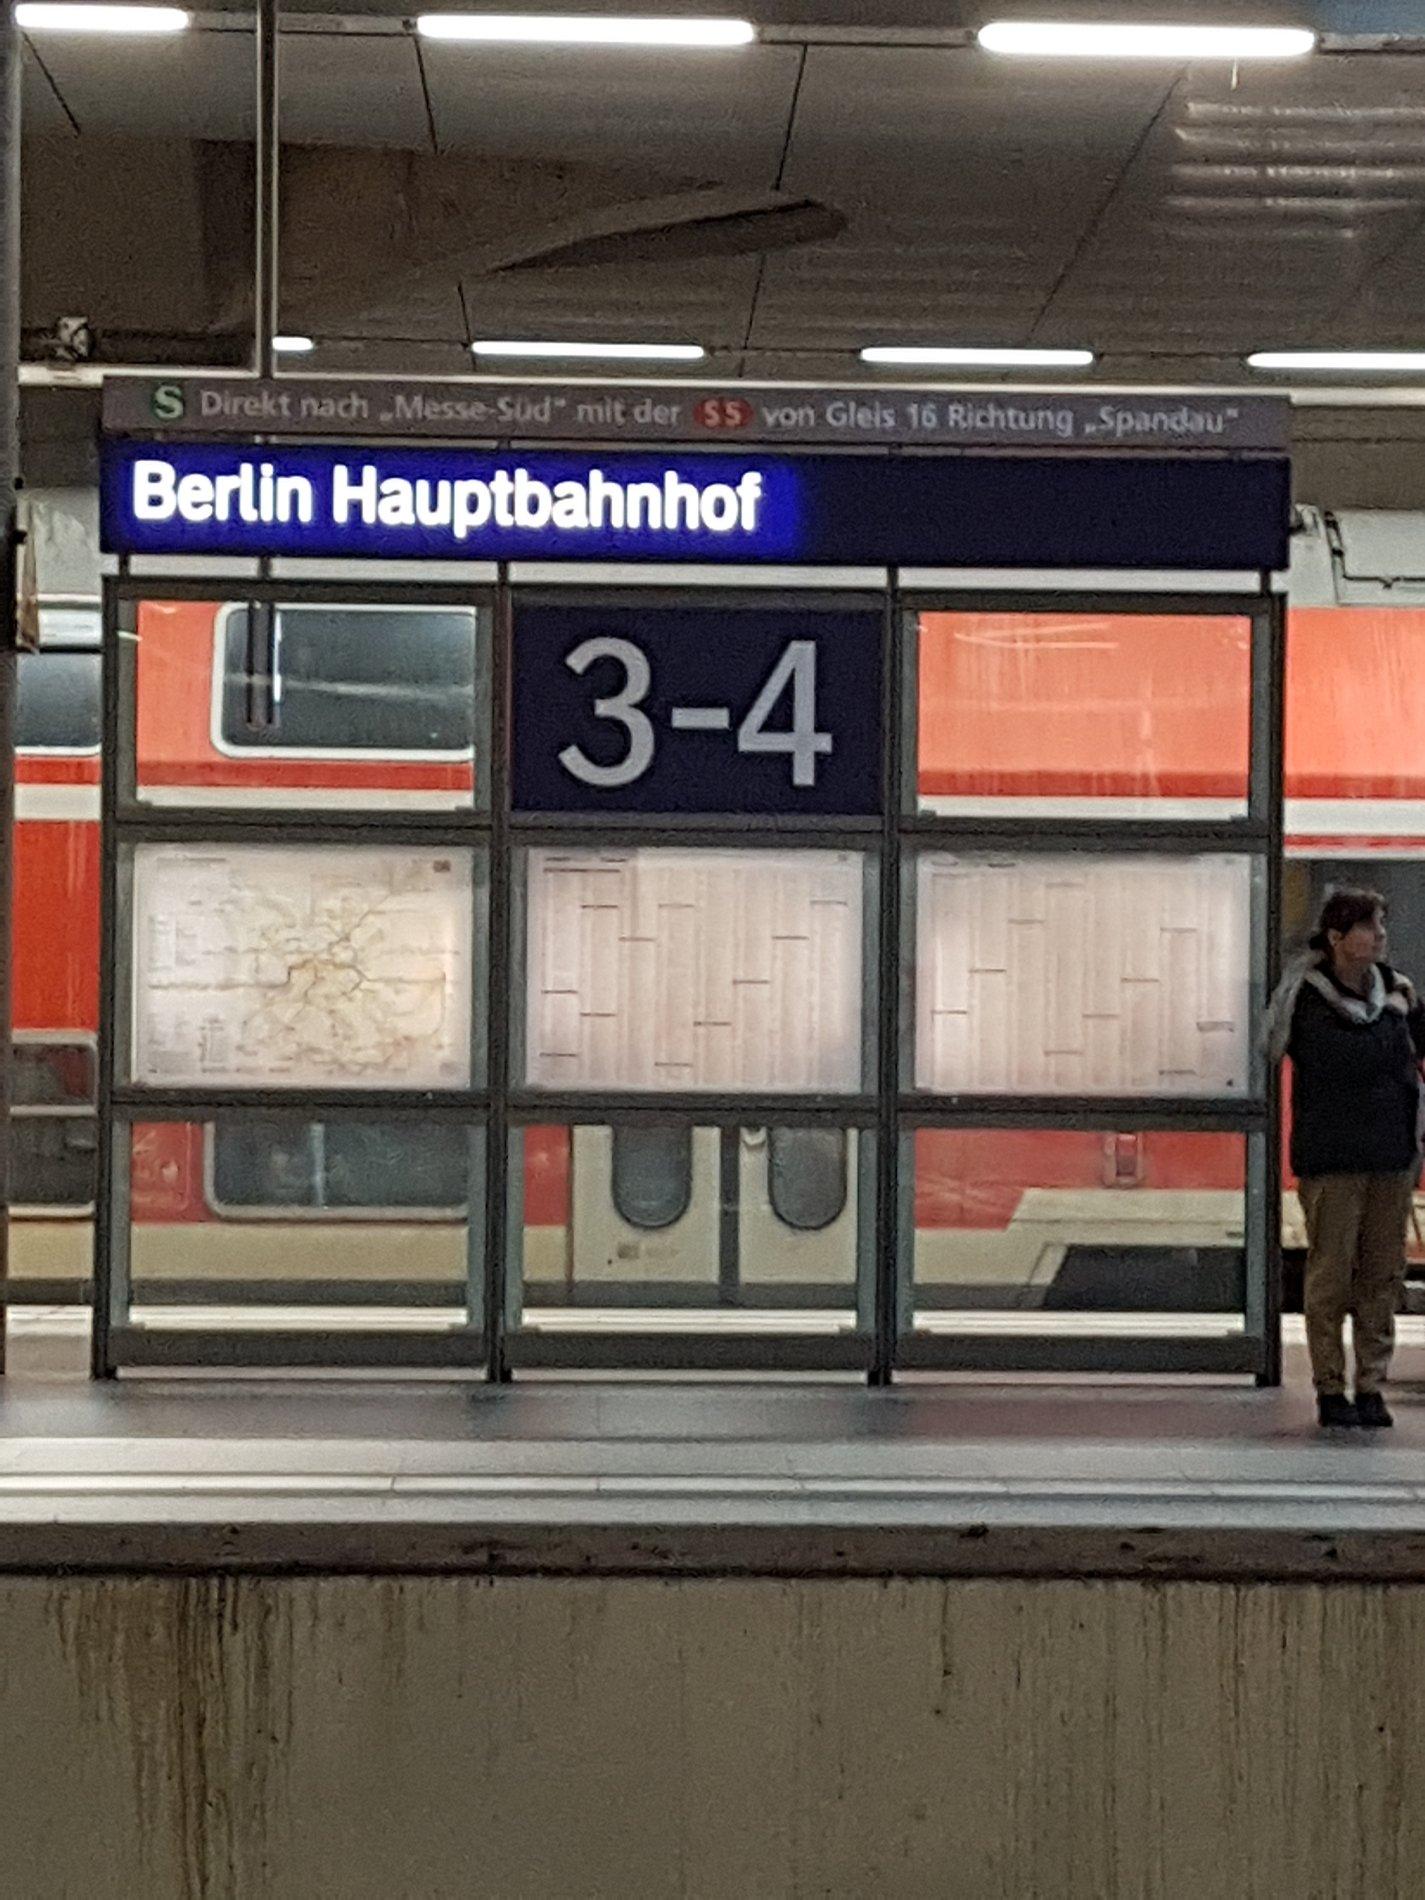 Back to #Karlsruhe - Bye bye & thank U #Stallwaechterparty 2017 #bwjetzt https://t.co/UegNMSrSeH https://t.co/fmOzQoKFJv